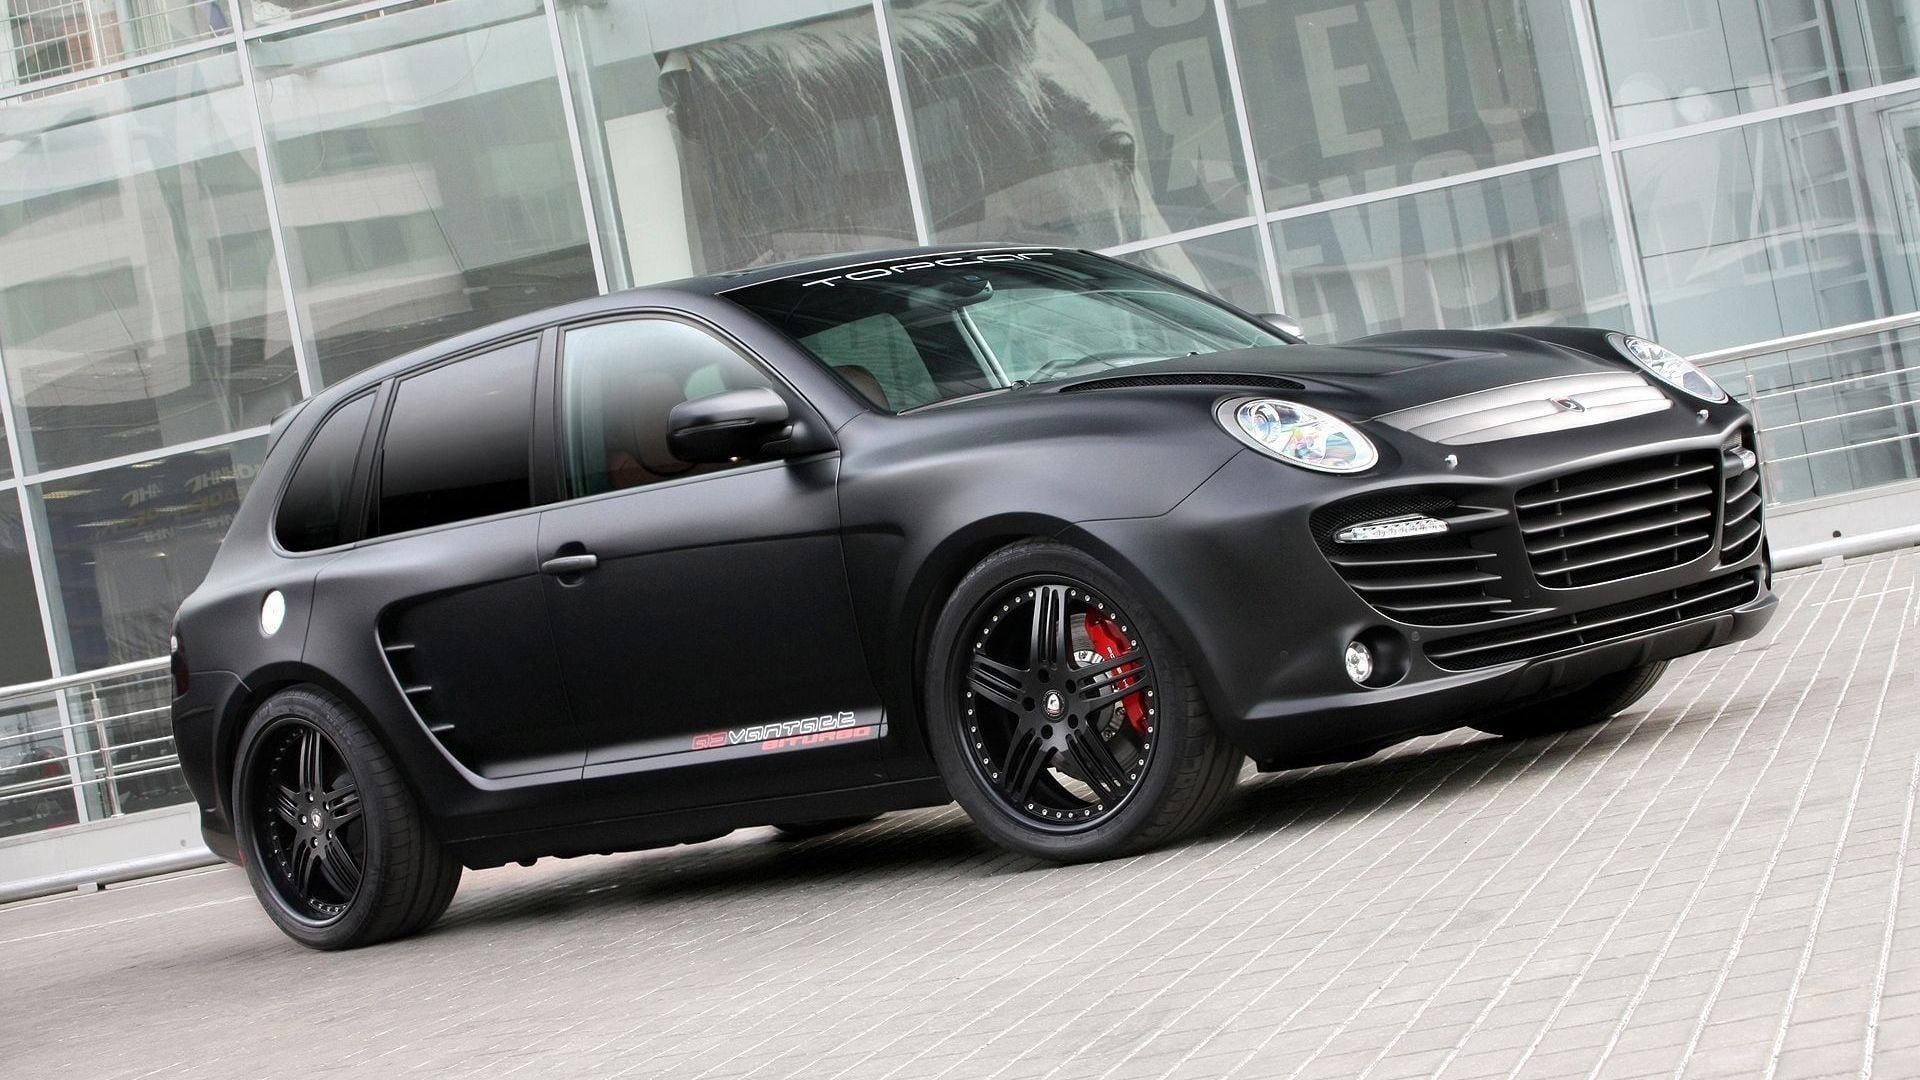 Porsche Cayenne Black Matte 1920x1080 Wallpaper Teahub Io